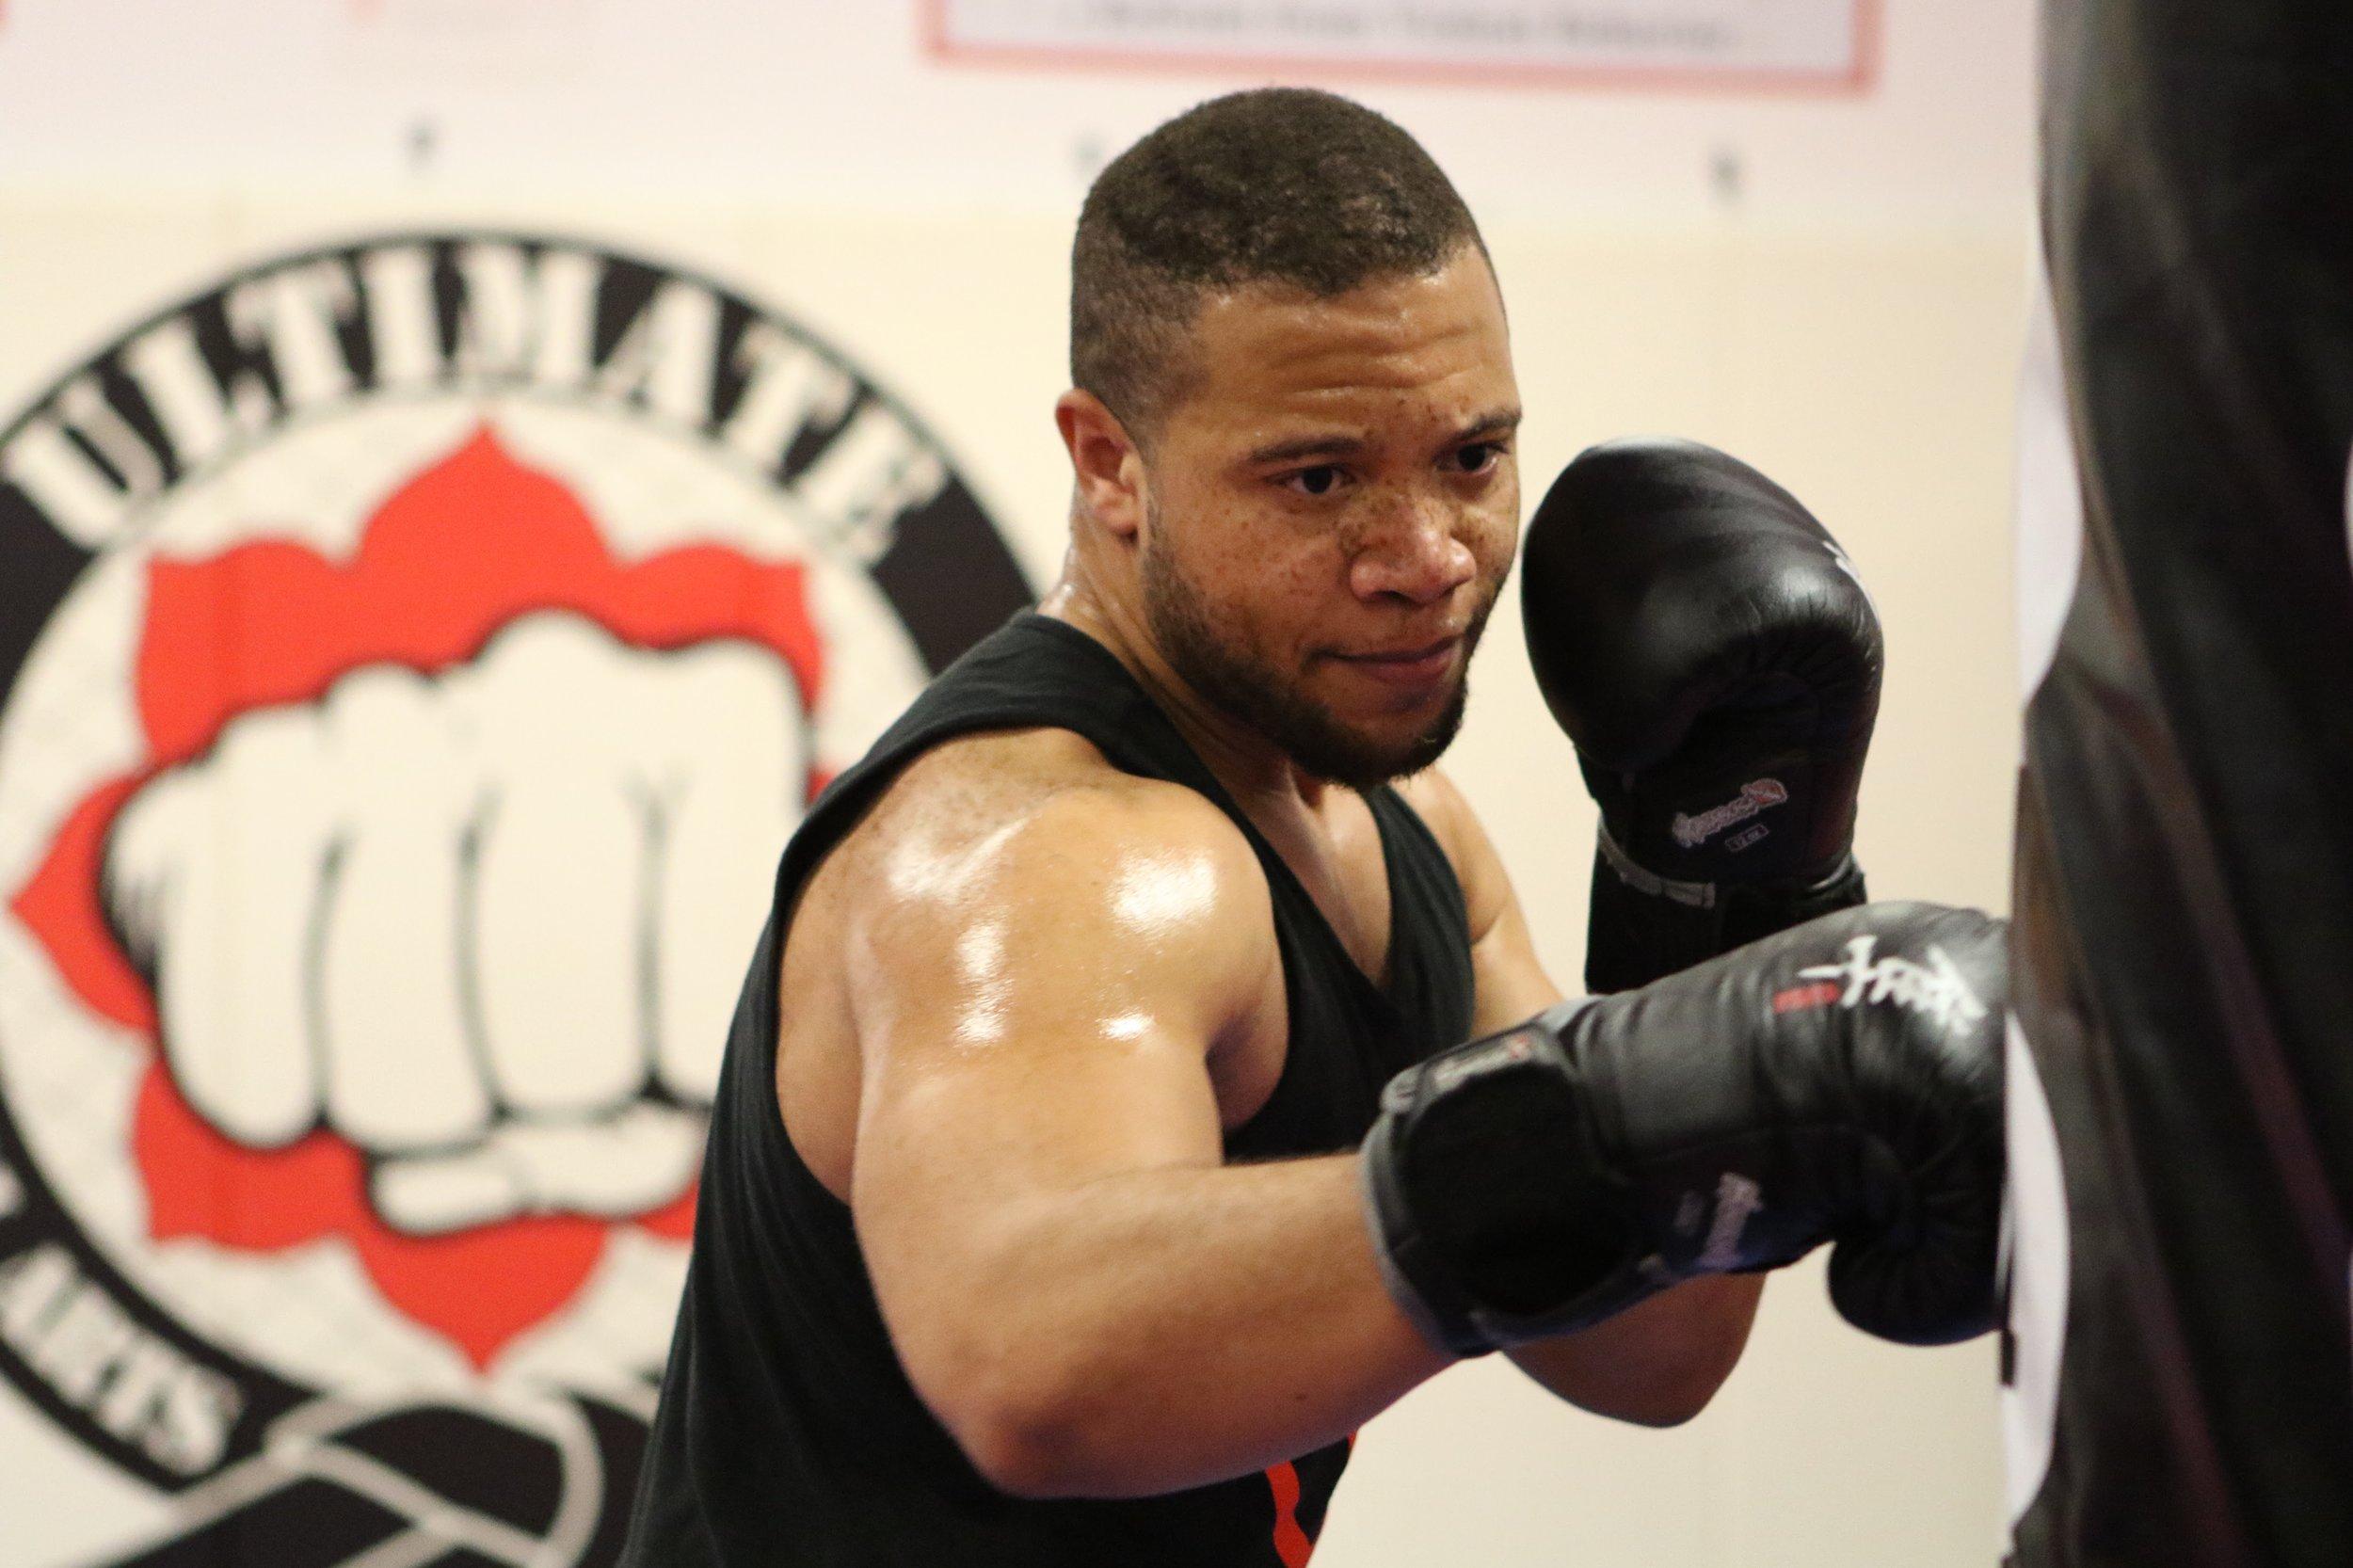 MMA guy punching Bag.JPG